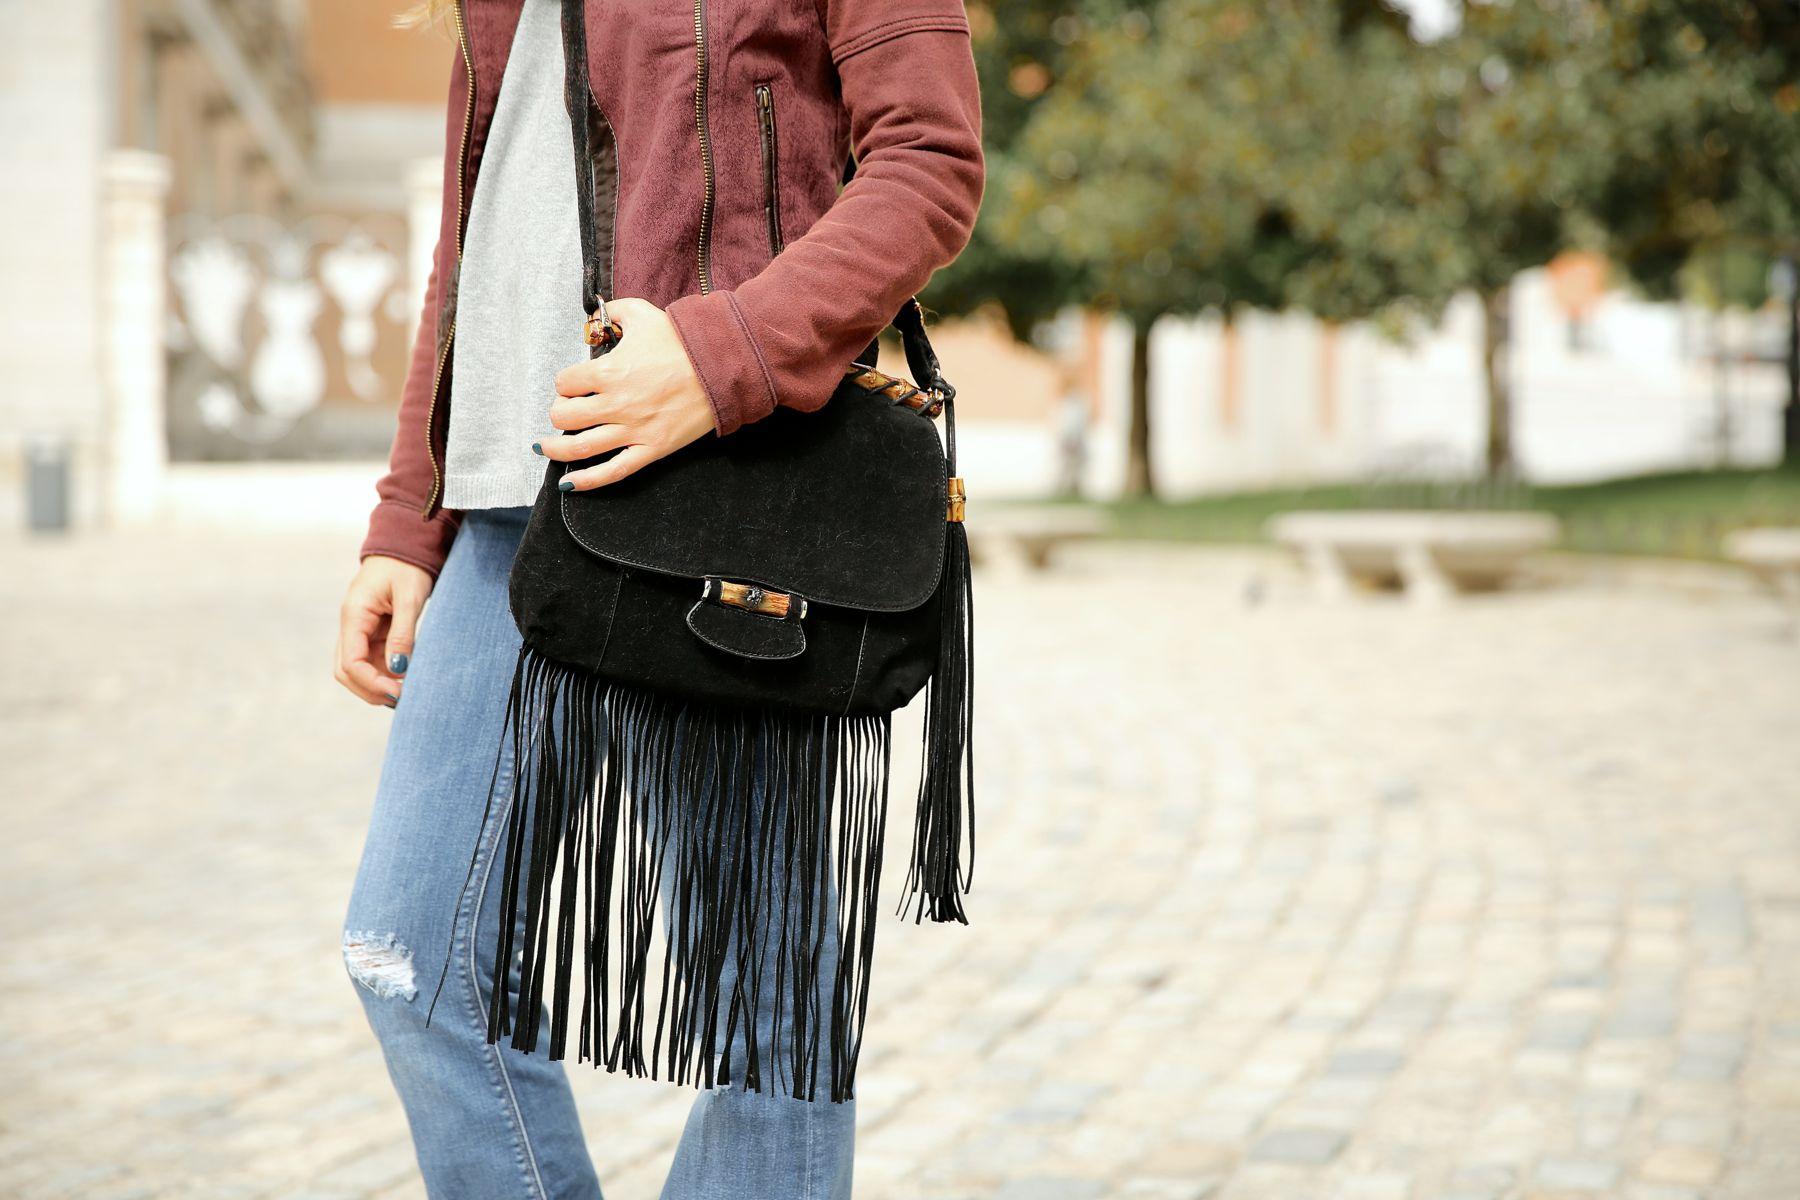 trendy_taste-look-outfit-street_style-ootd-blog-blogger-fashion_spain-moda_españa-AD-adolfo_dominguez-amaia_salamanca-boho-hippie-sombrero-hat-biker-flecos-fringes-1